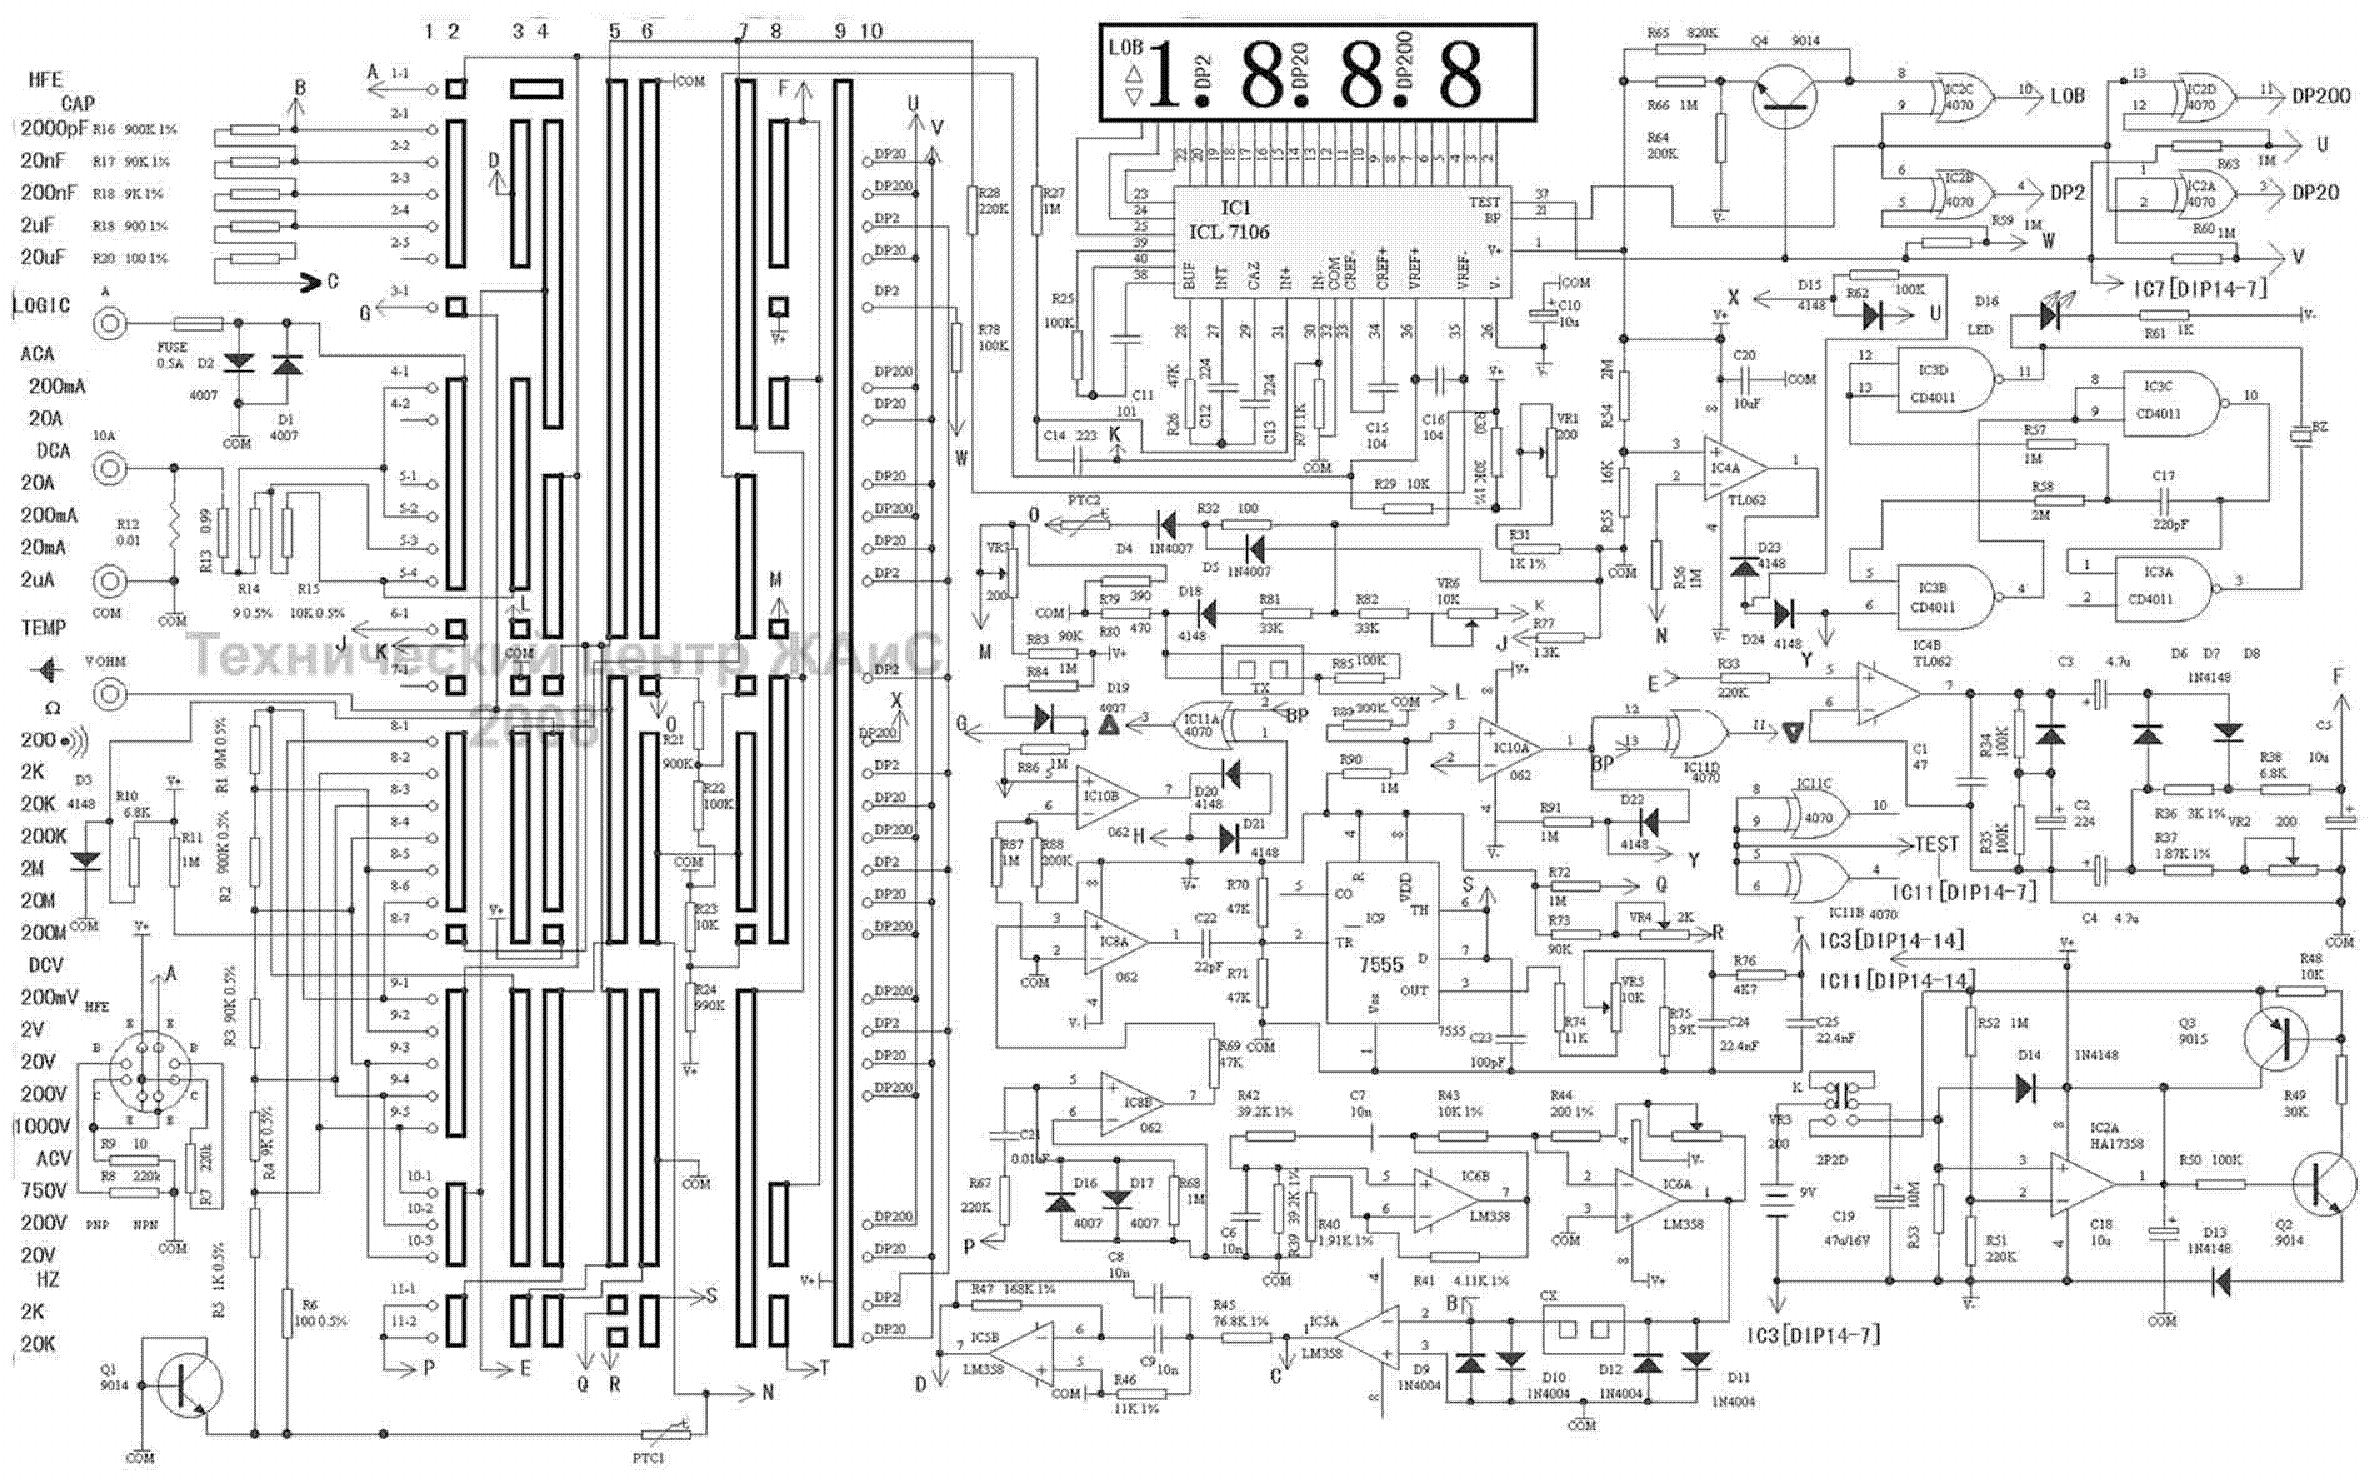 multimeter dt9208 sch service manual download  schematics  eeprom  repair info for electronics